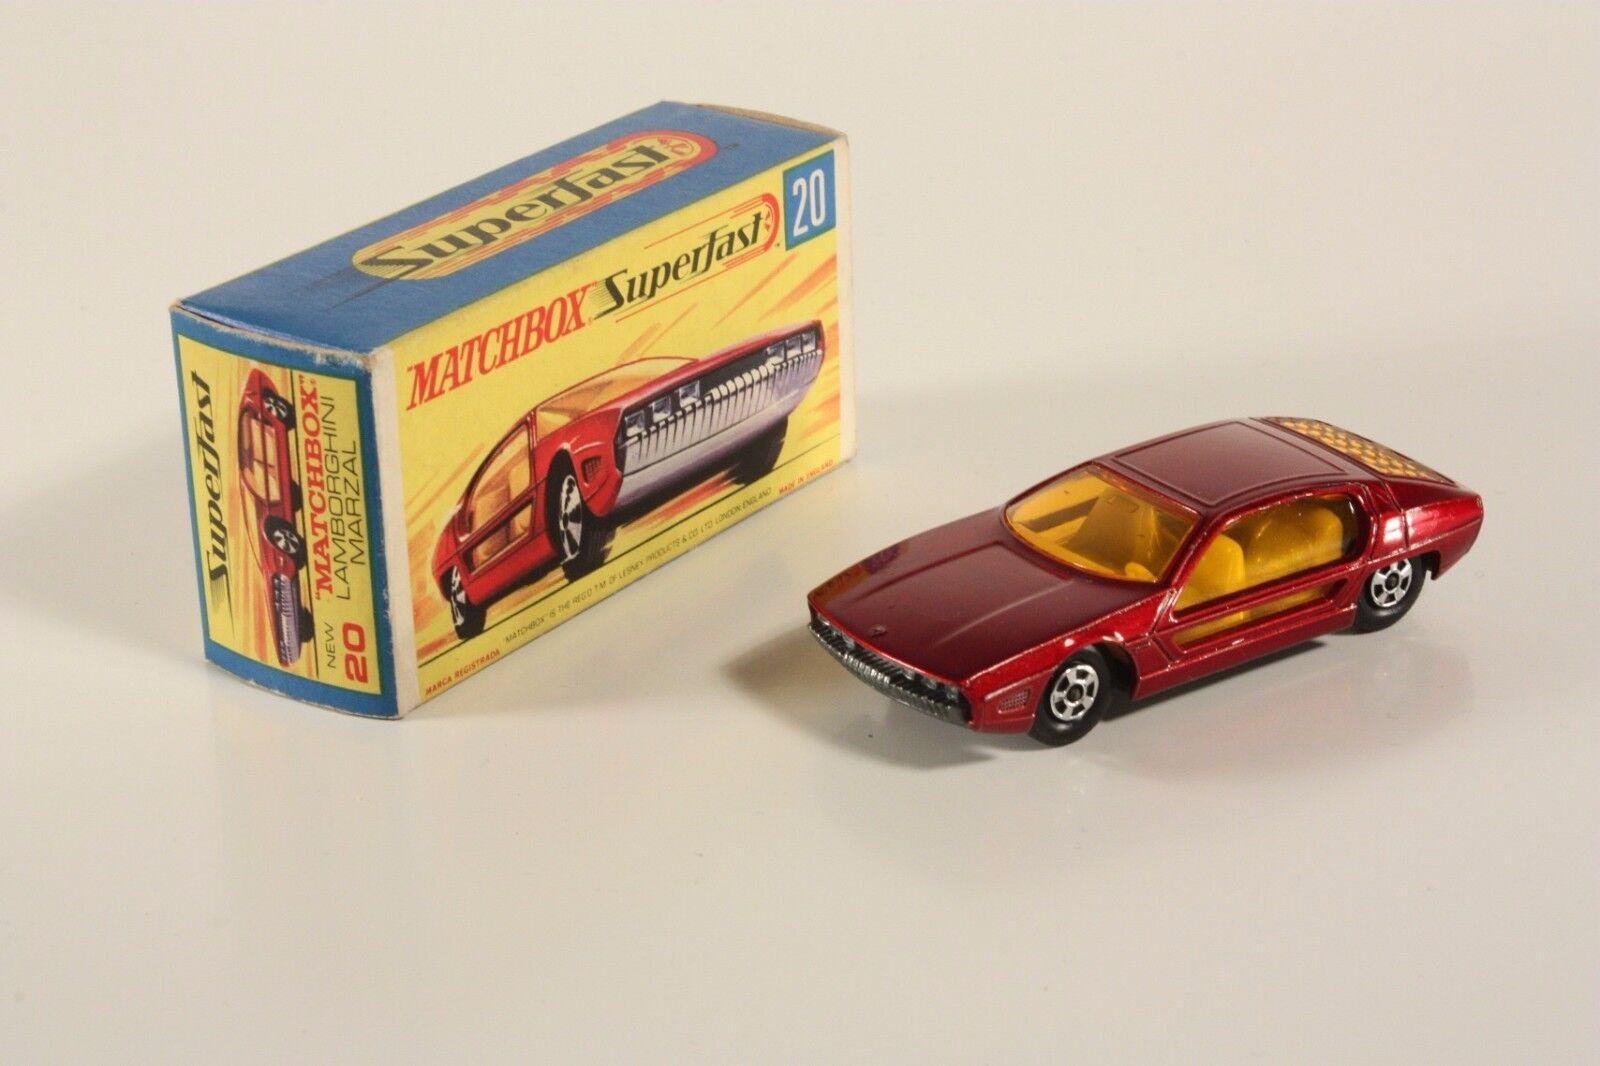 MATCHBOX 20, Lamborghini Marzal, Comme neuf Dans Box  ab1796